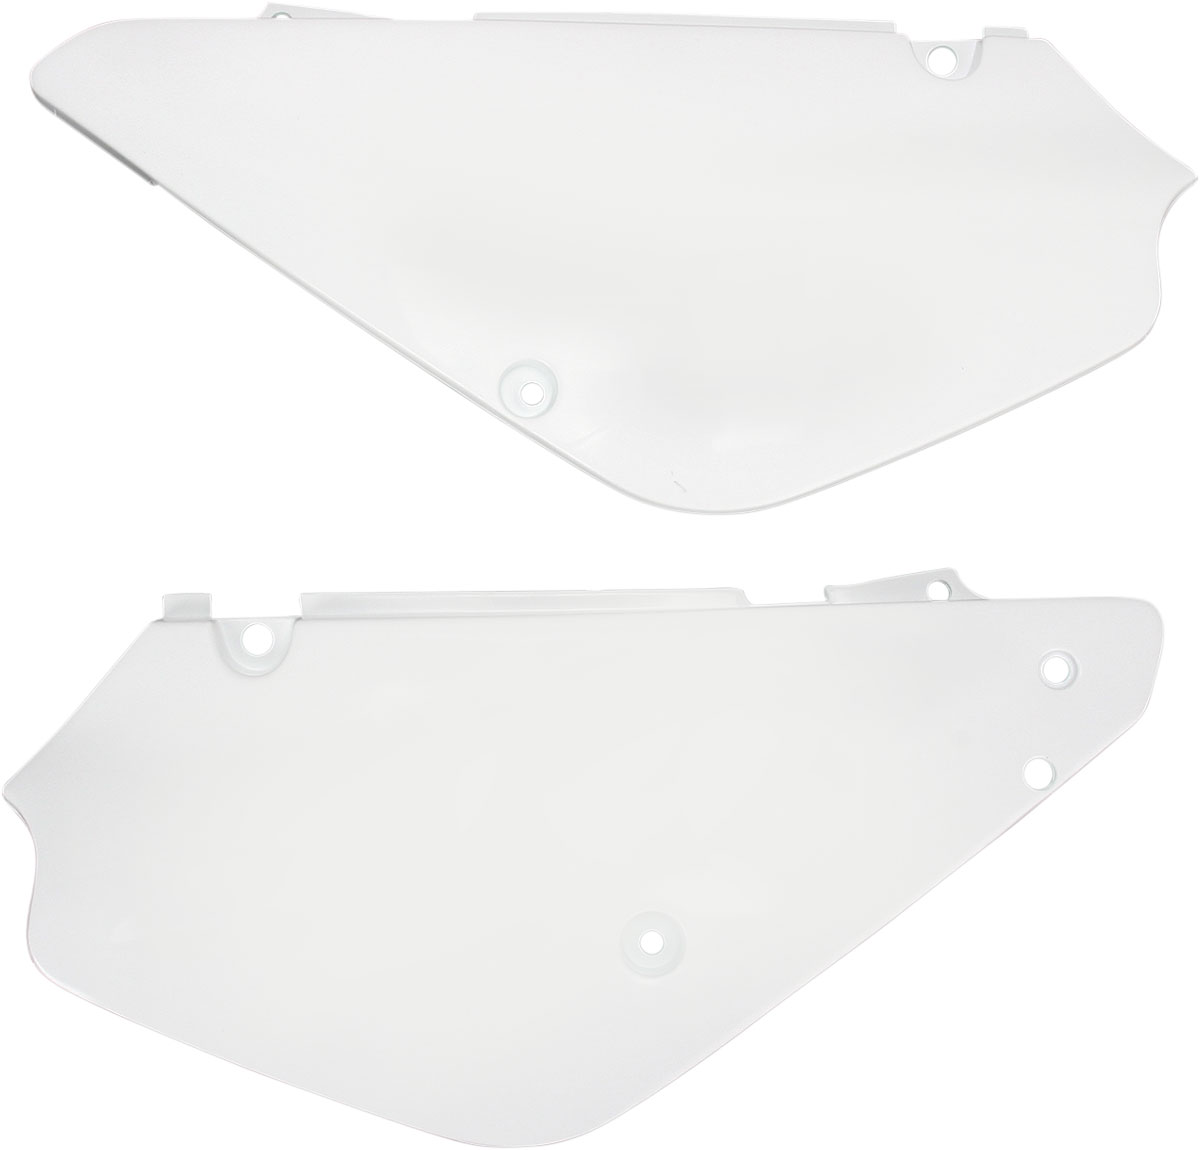 ACERBIS Side Panels (White)